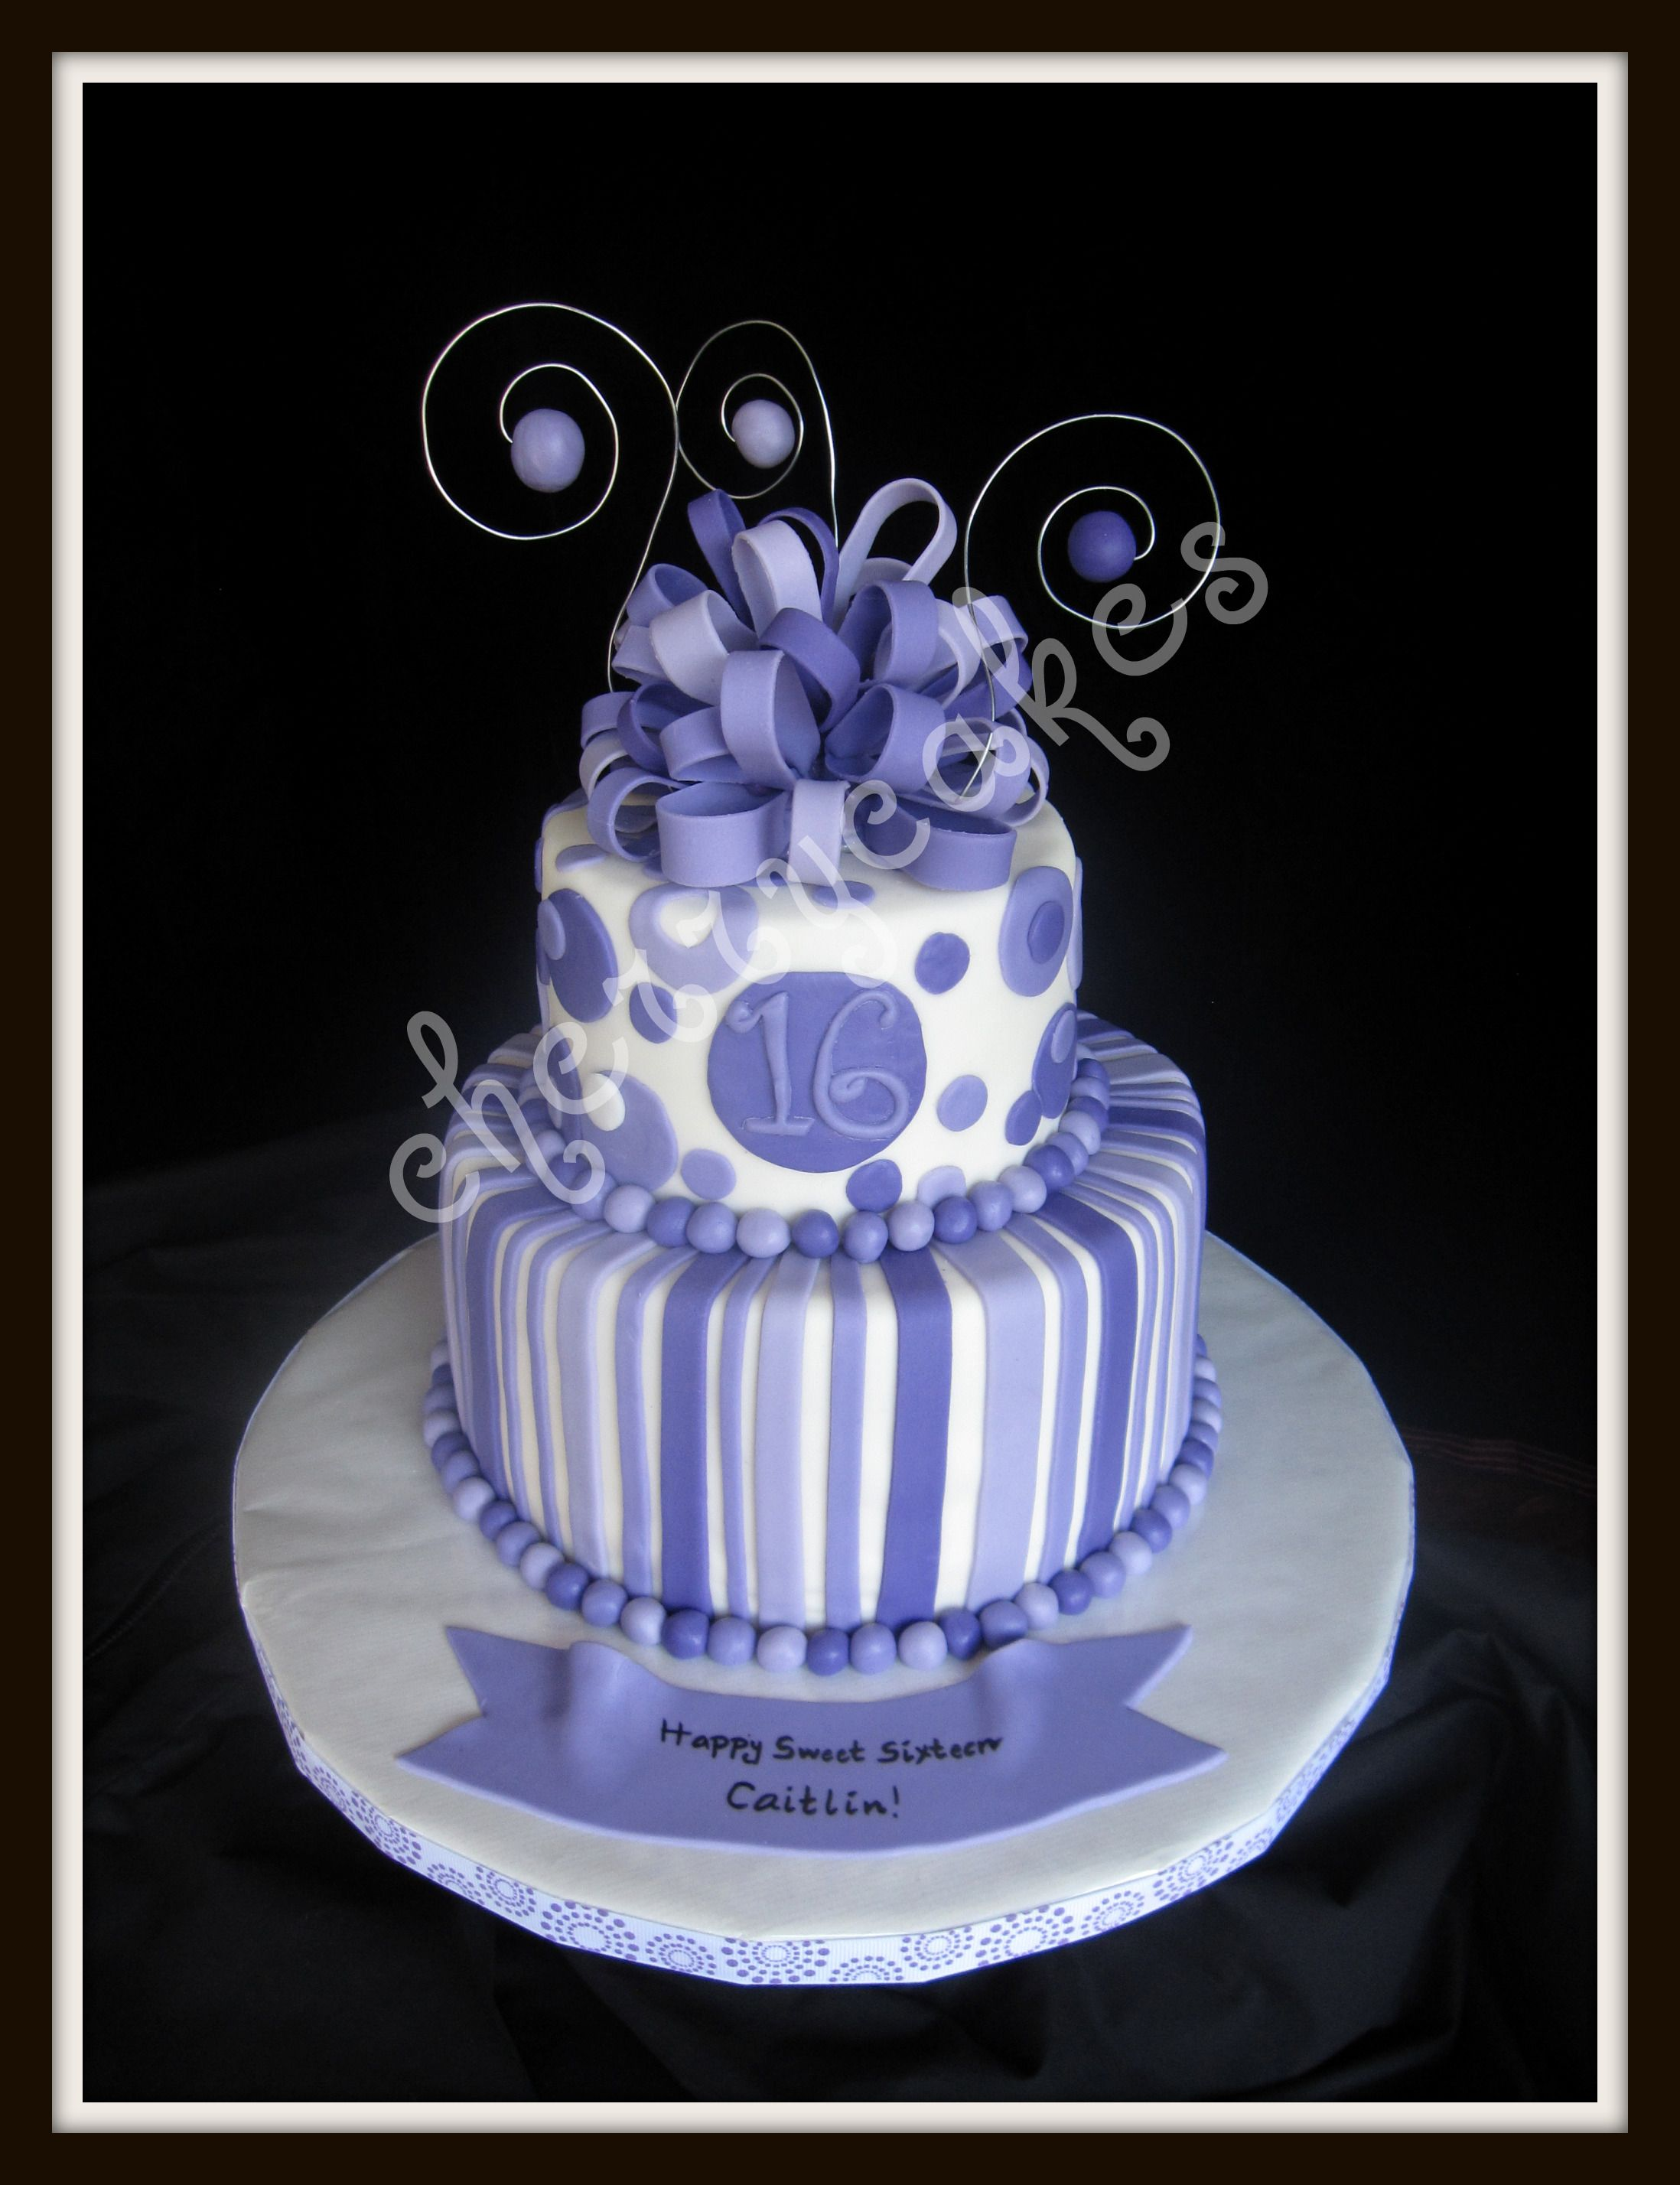 Swell Caitlin Sweet 16 Birthday Cake 16 Birthday Cake Cake Cover Funny Birthday Cards Online Kookostrdamsfinfo